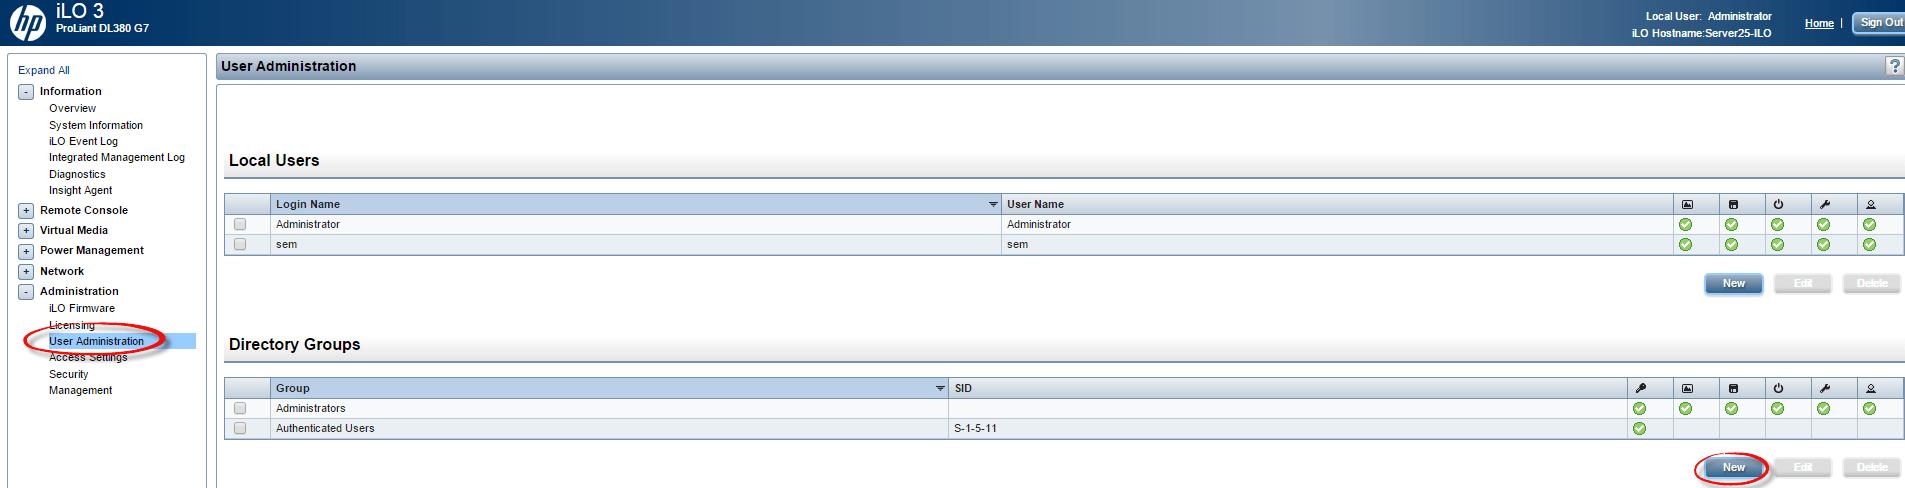 Как настроить аутентификацию Active Directory на HP iLO 3 через WEB интерфейс ILO-01